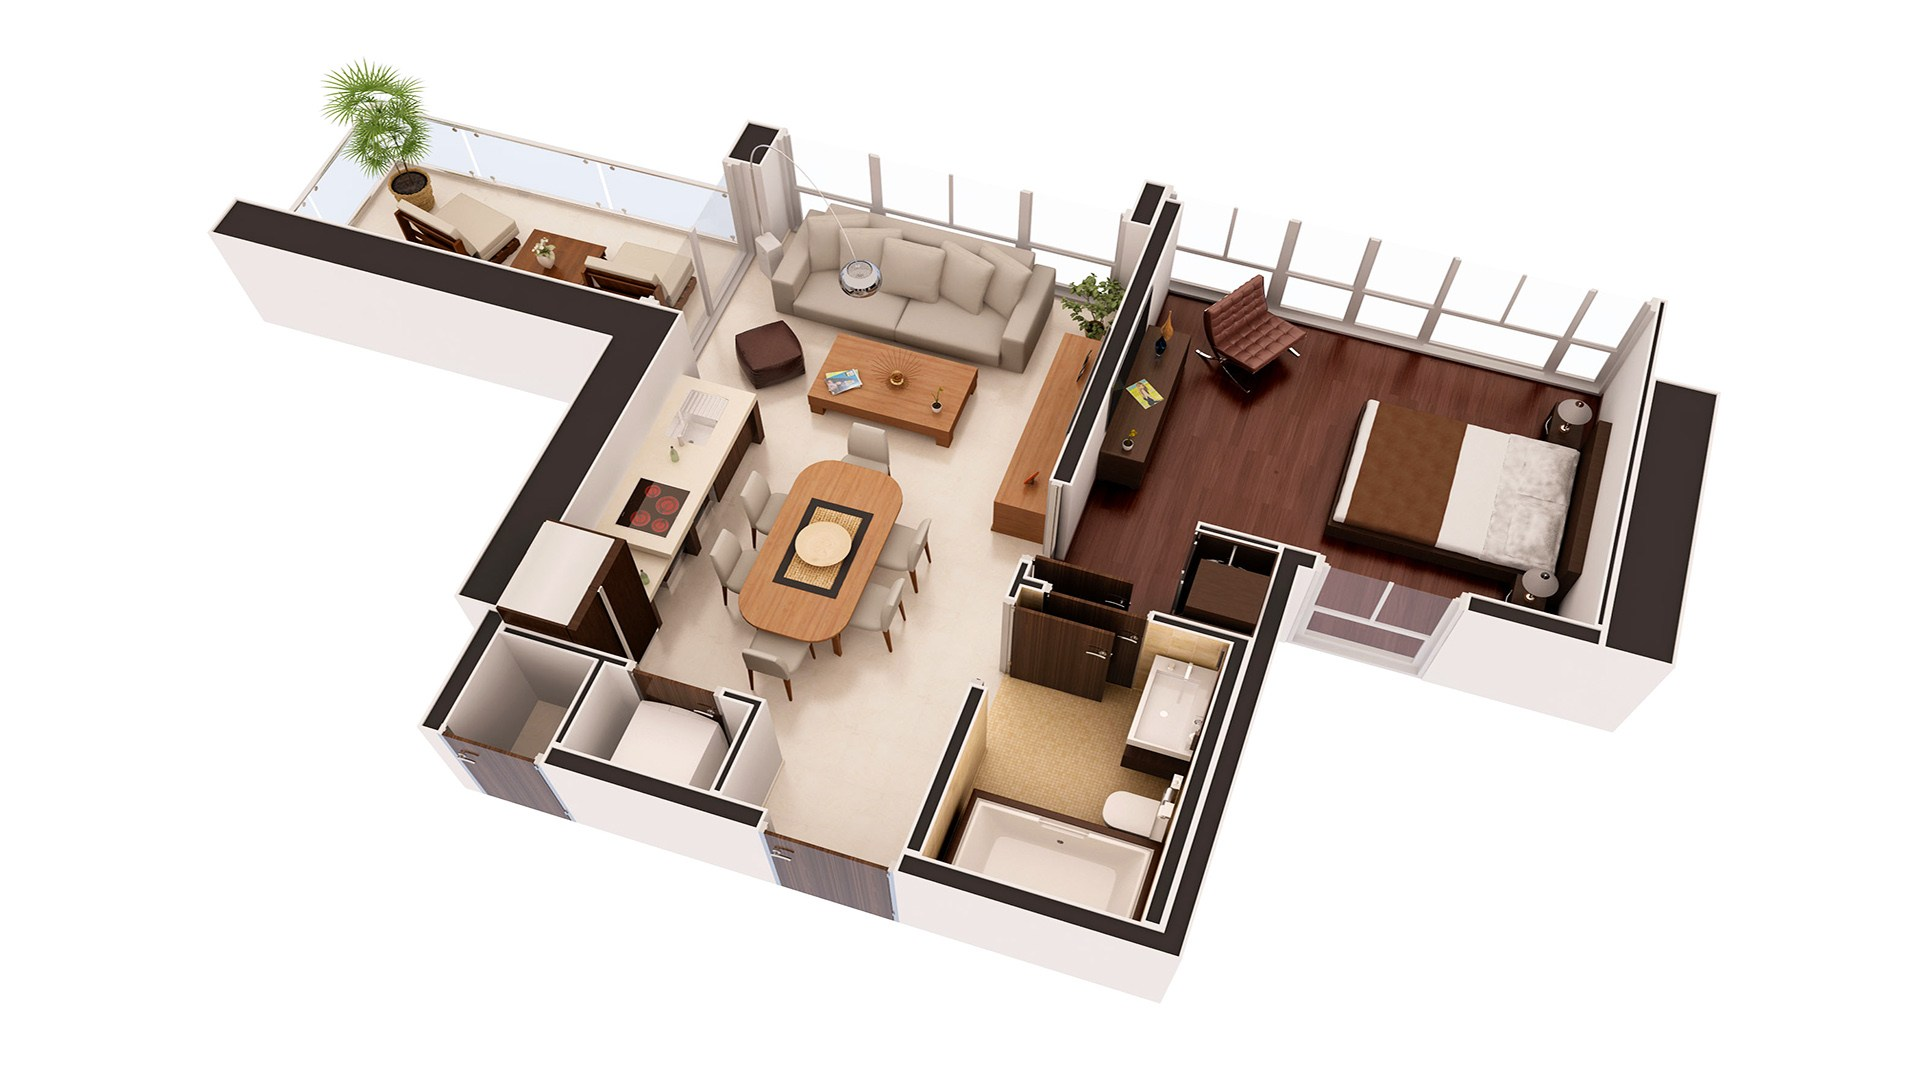 3D Render Floor Plan residence 3